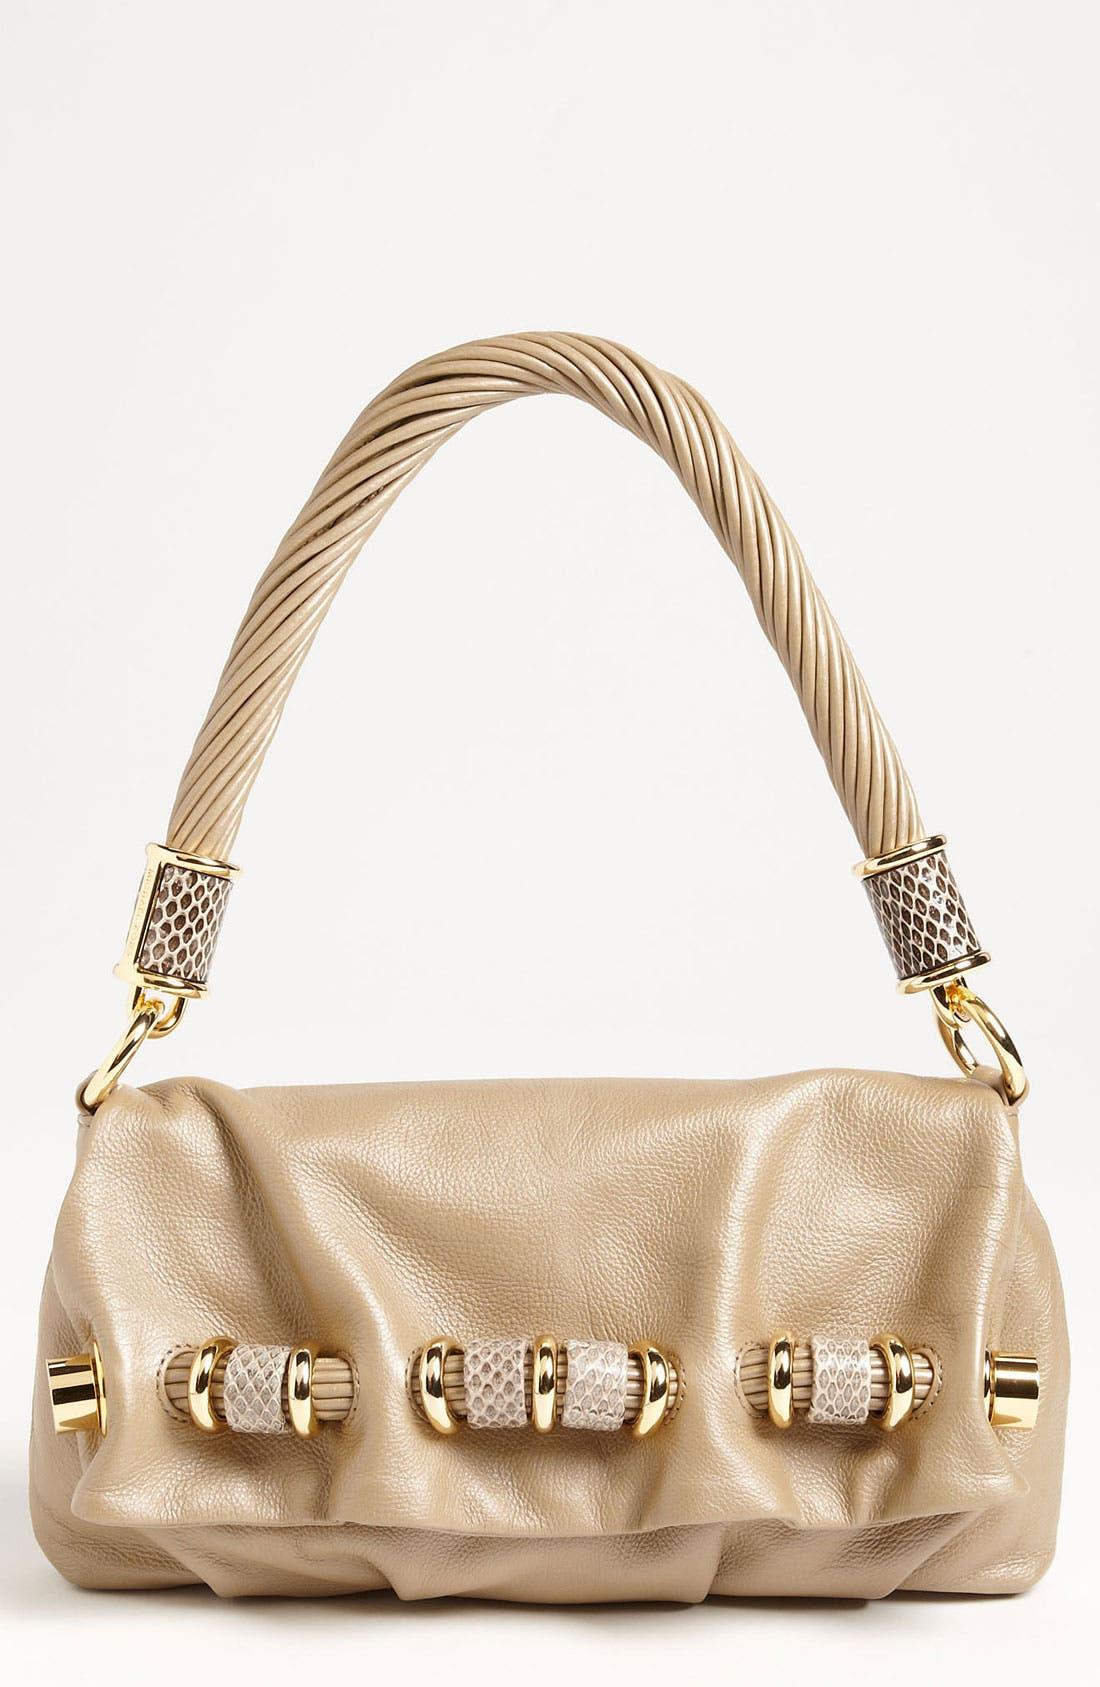 Main Image - Michael Kors 'Tonne - Small' Calfskin Leather Shoulder Bag